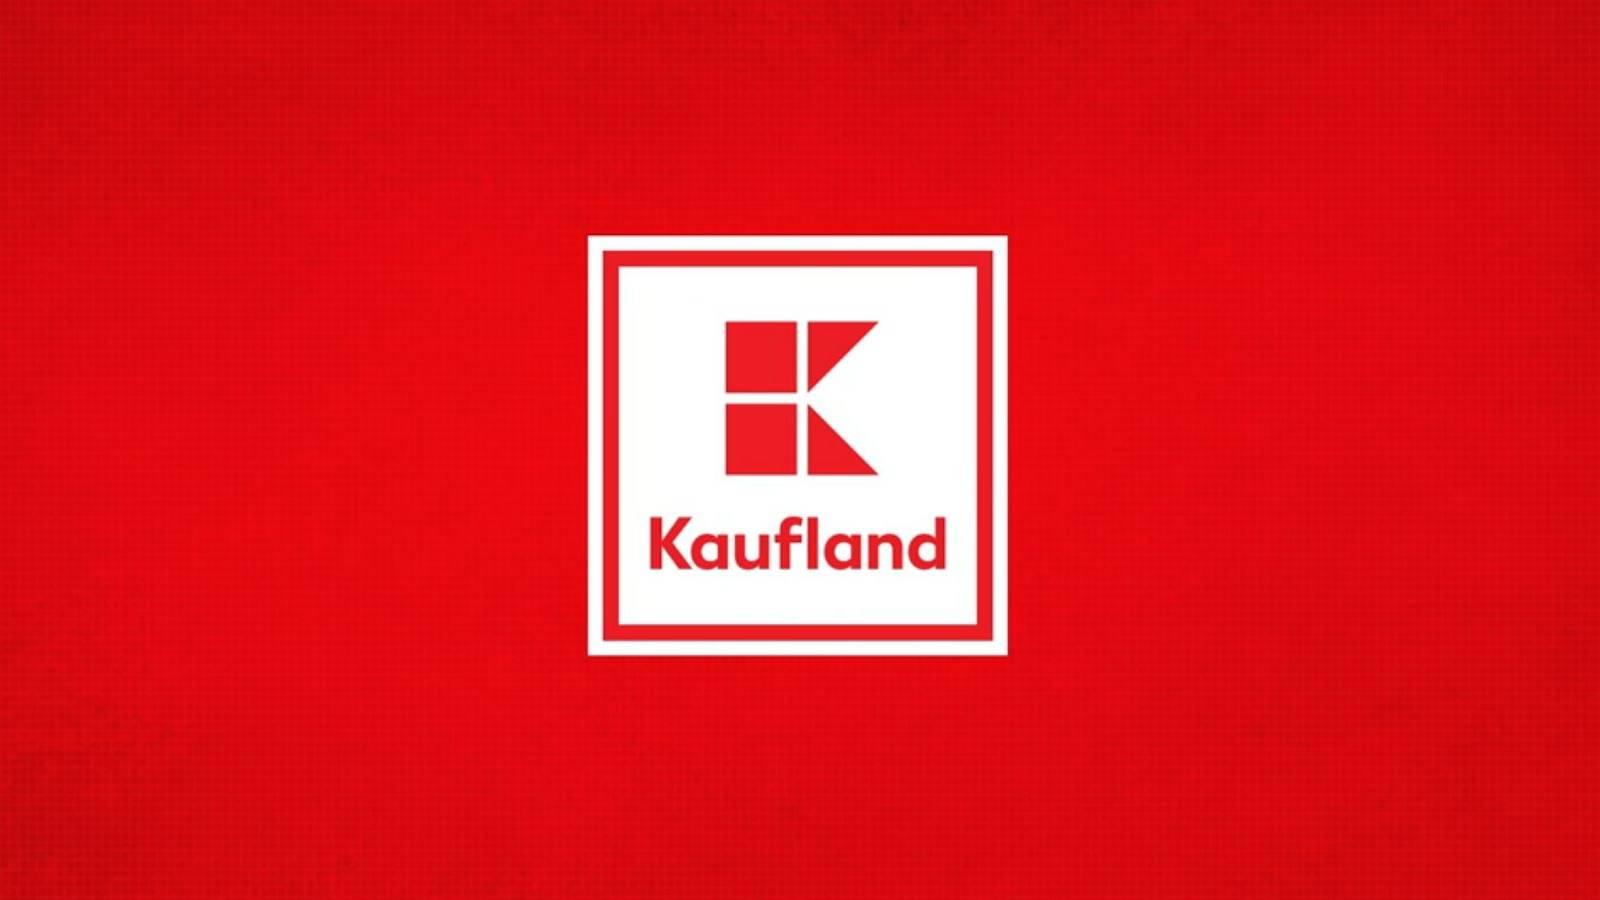 Kaufland tombola